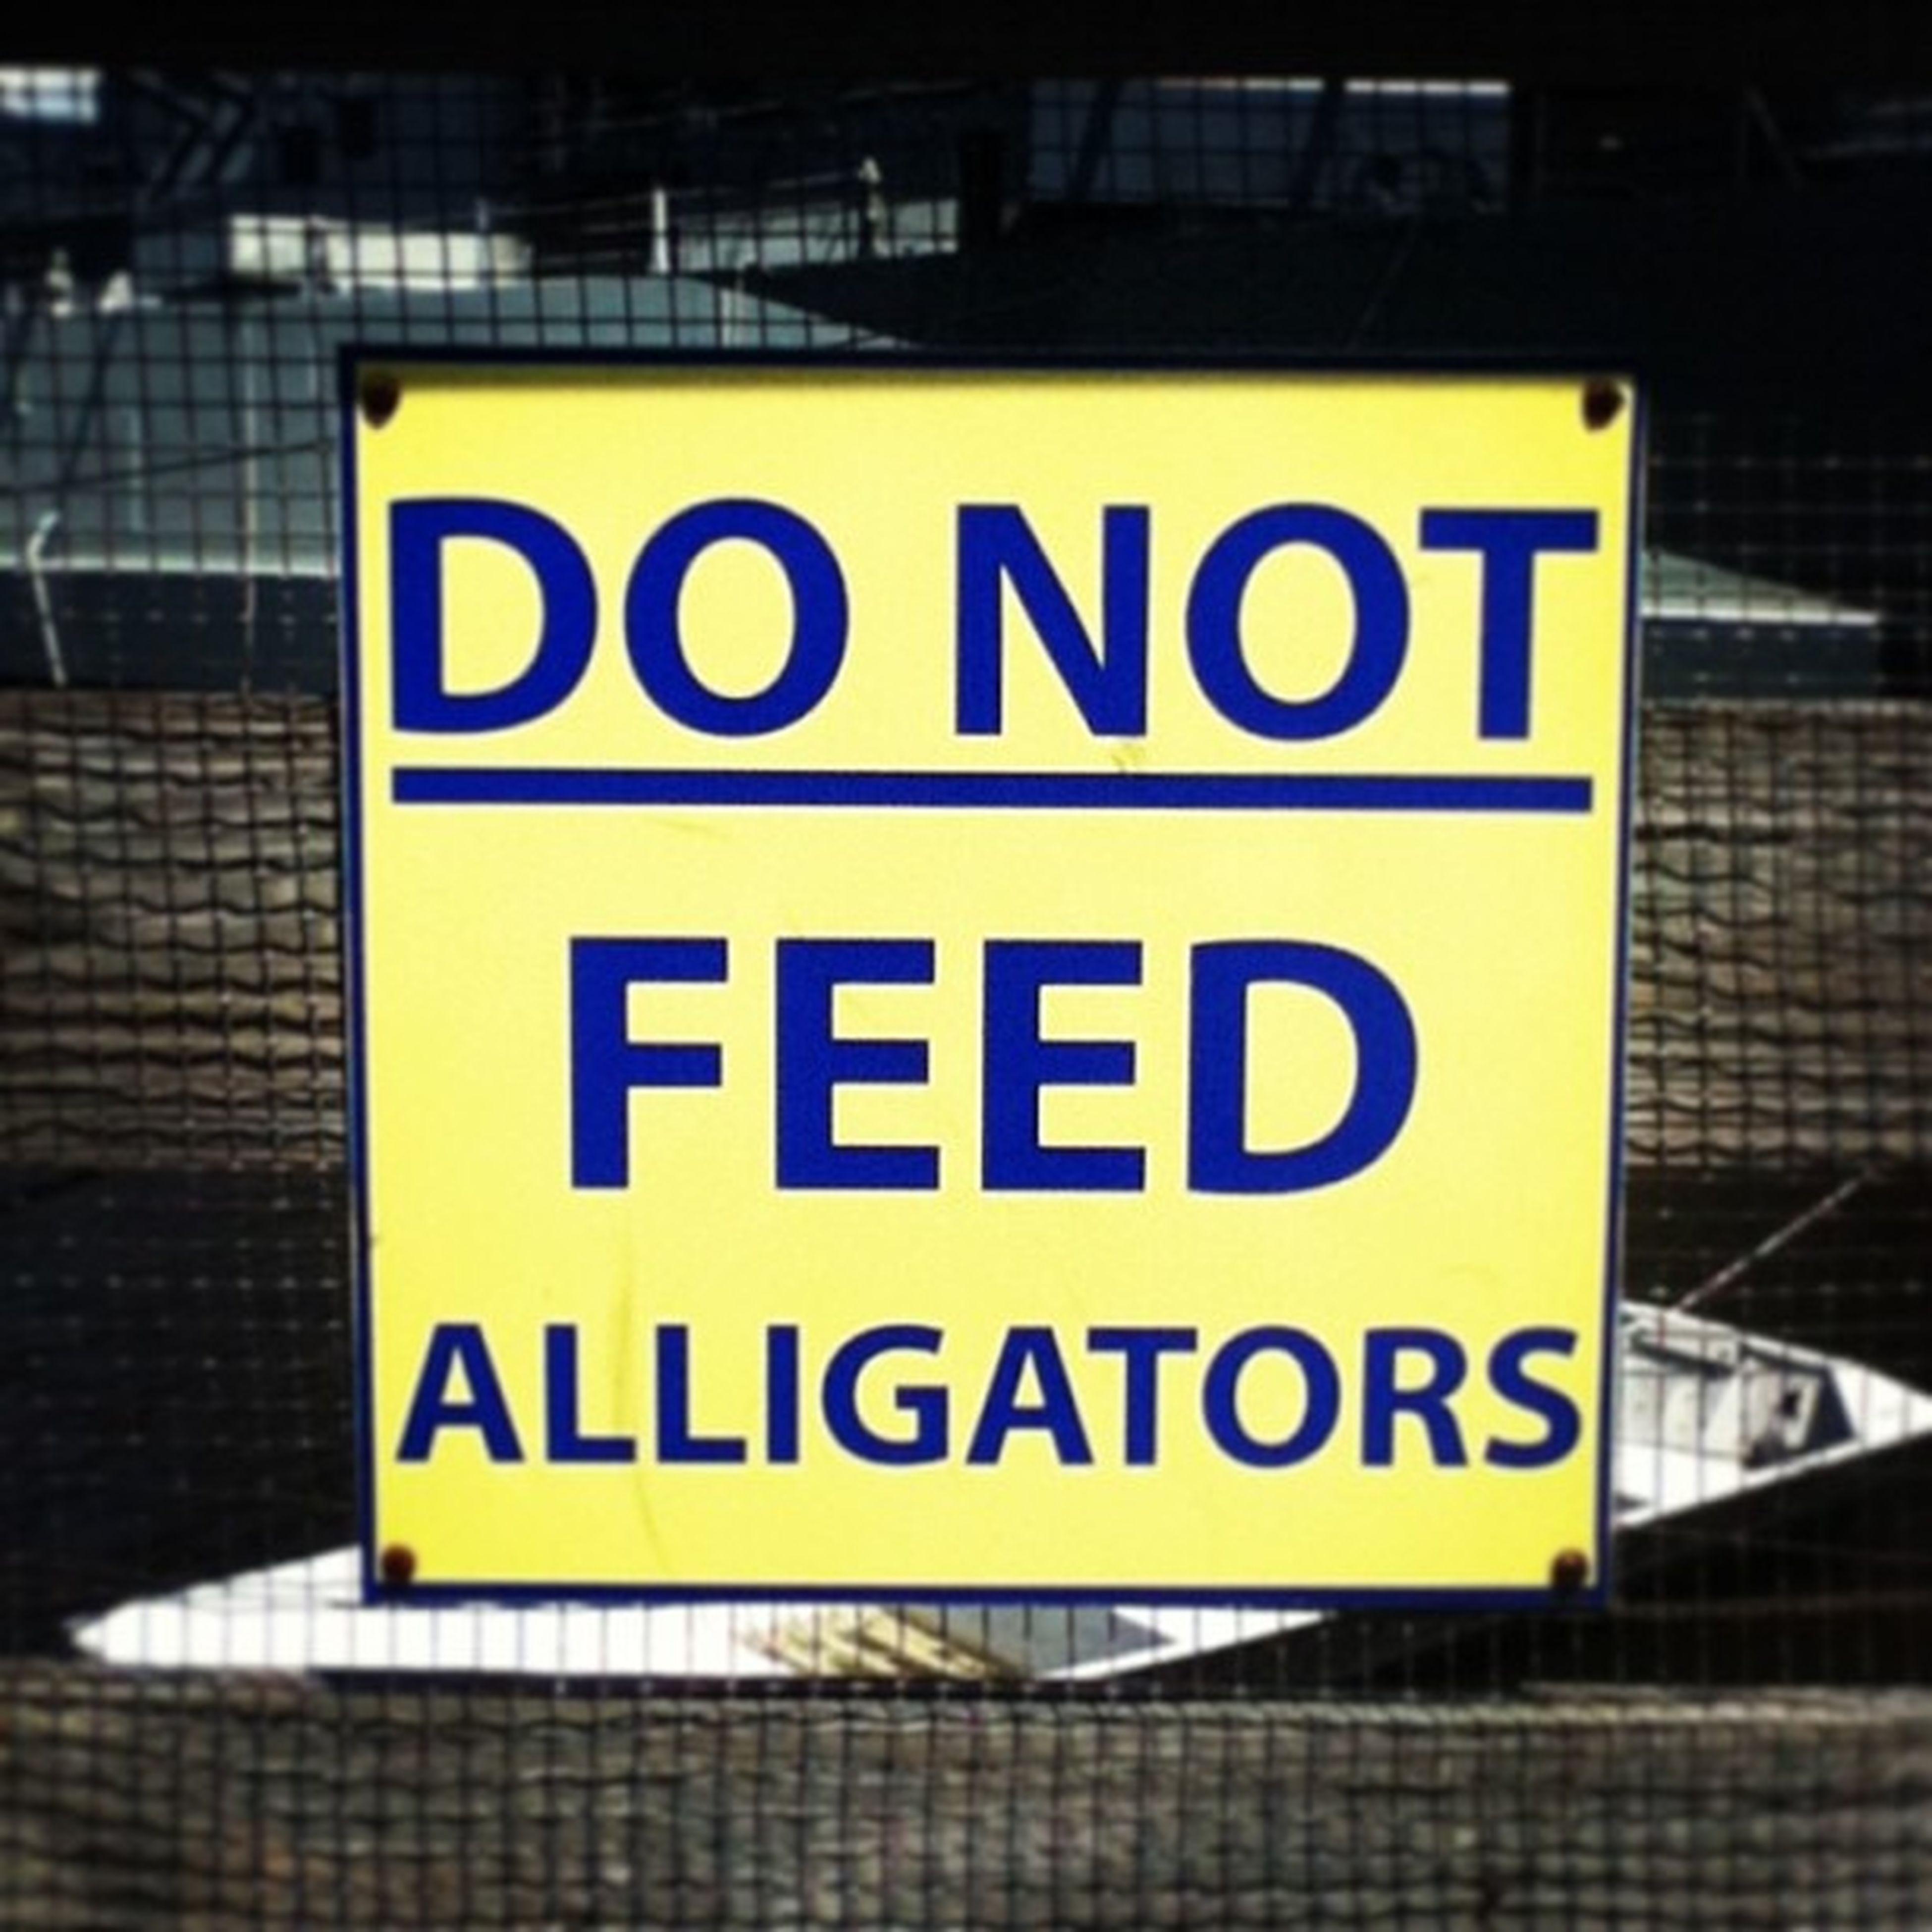 Alligators? ??Donotfeedalligators Do Not Feed  alligators ussnorthcarolina battleship memorial yellow blue sign